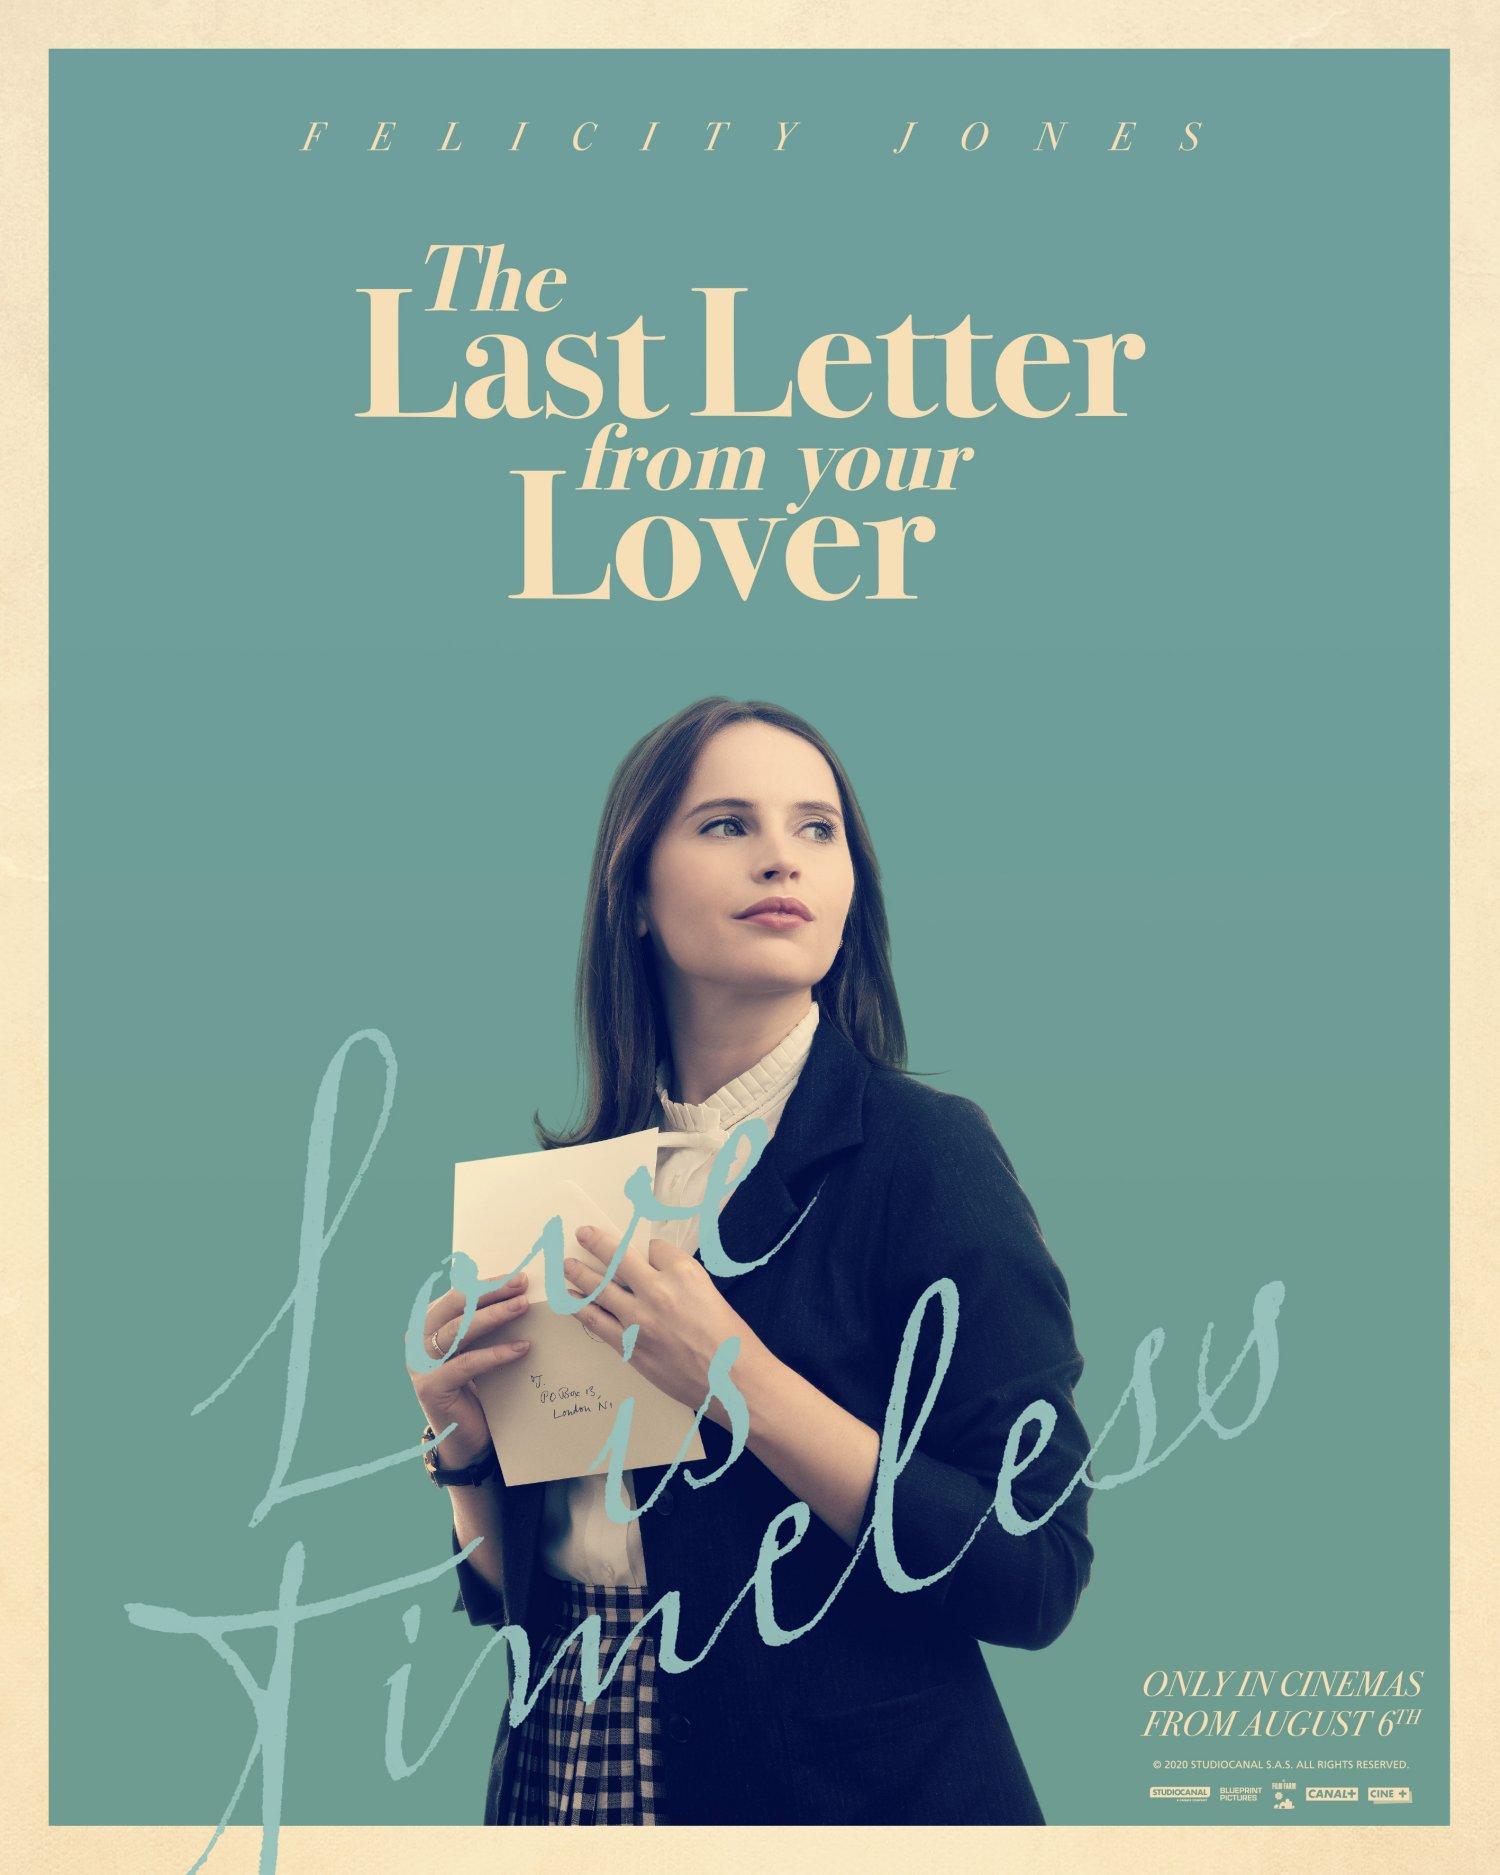 The-Last-Letter-from-Your-Lover-Character-Artworks-INTERNATIONAL-English-Original-Version-2835×3543-Last-Letter-SOCIAL-4×5-FELICITY-jpg